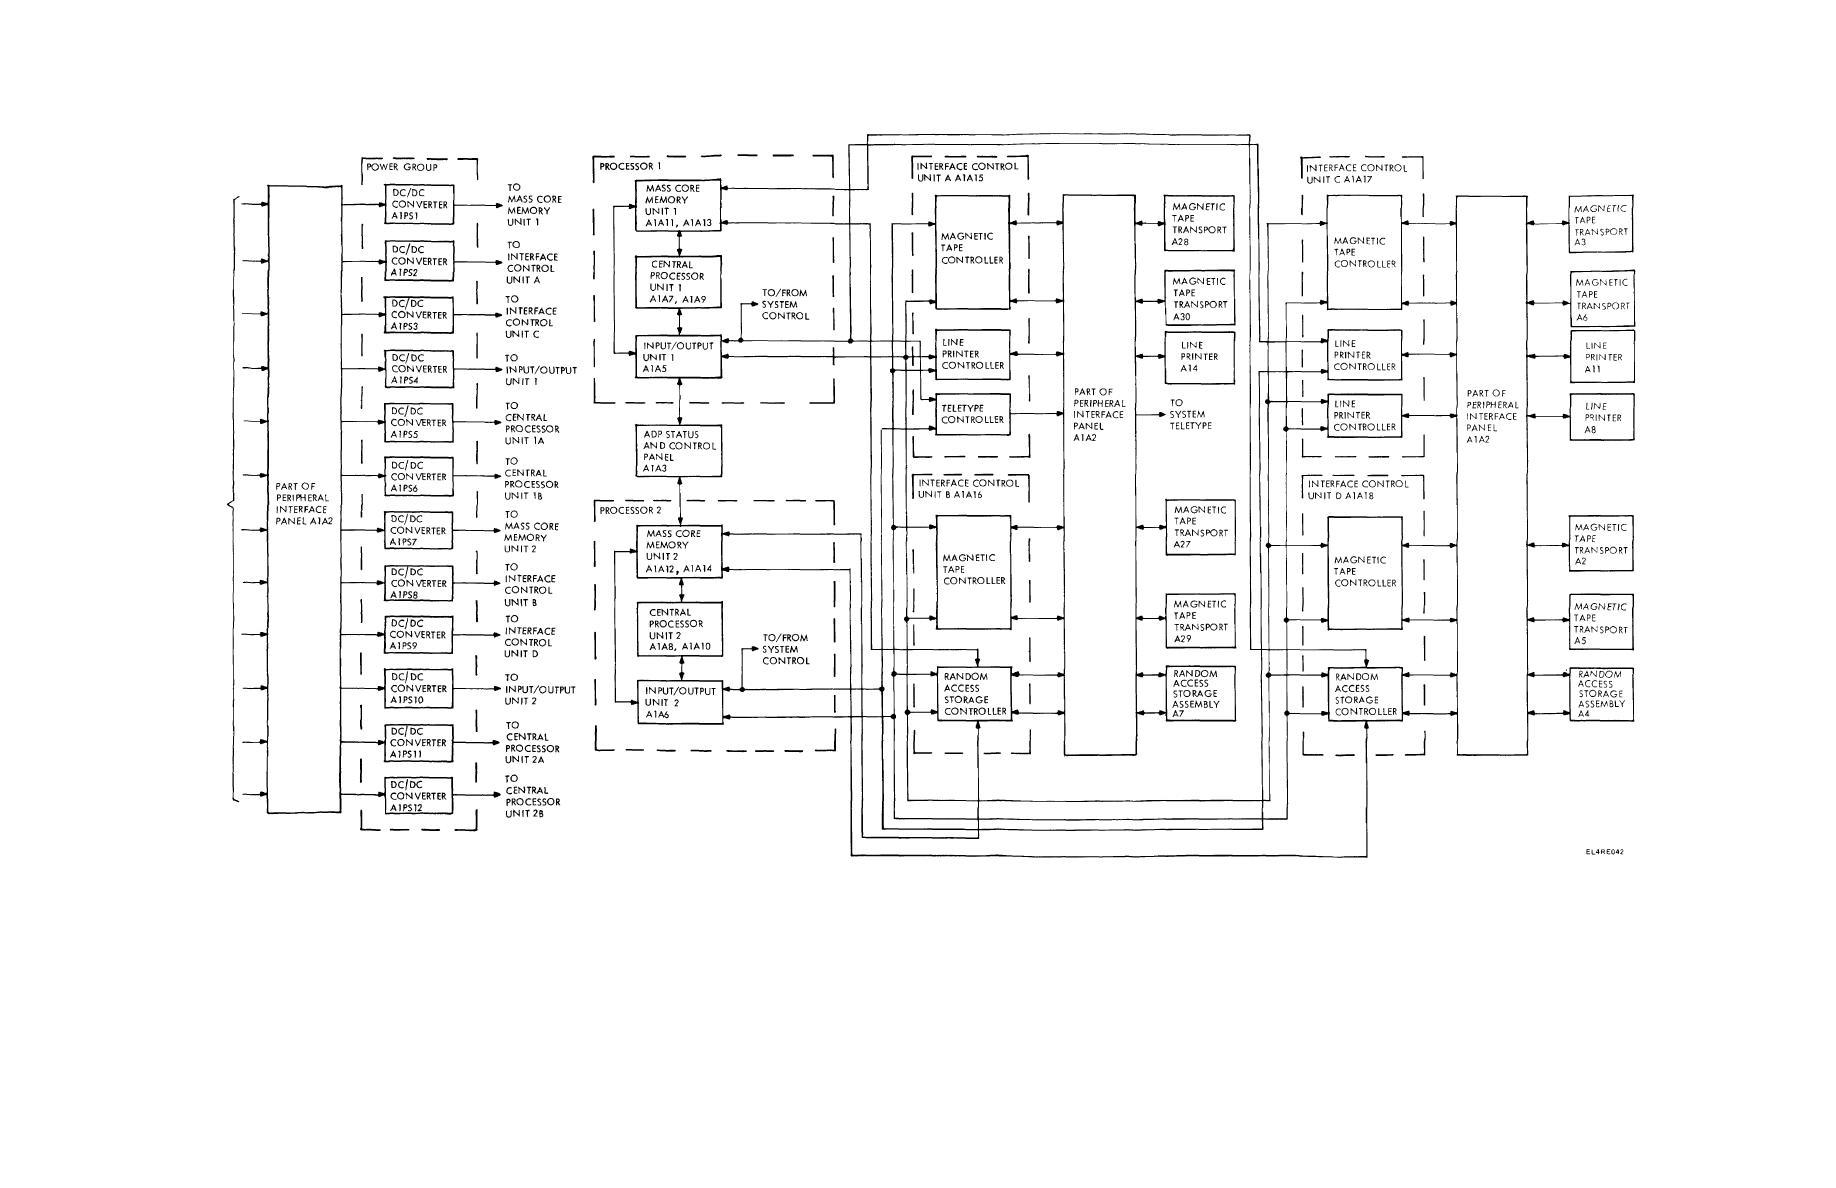 Figure Fo 4 Mscpg Block Diagram